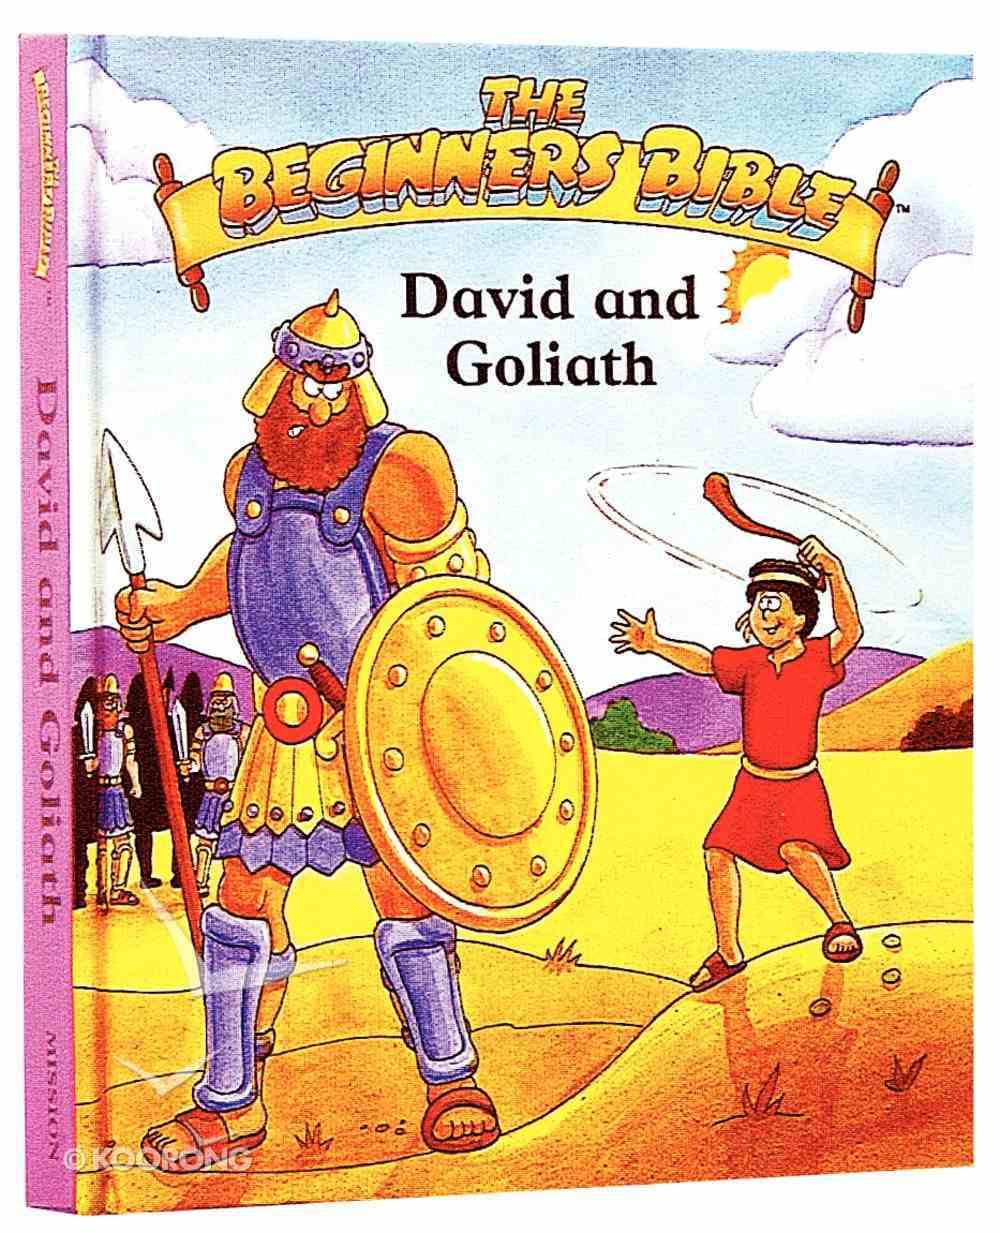 David and Goliath (Beginner's Bible Series) Hardback